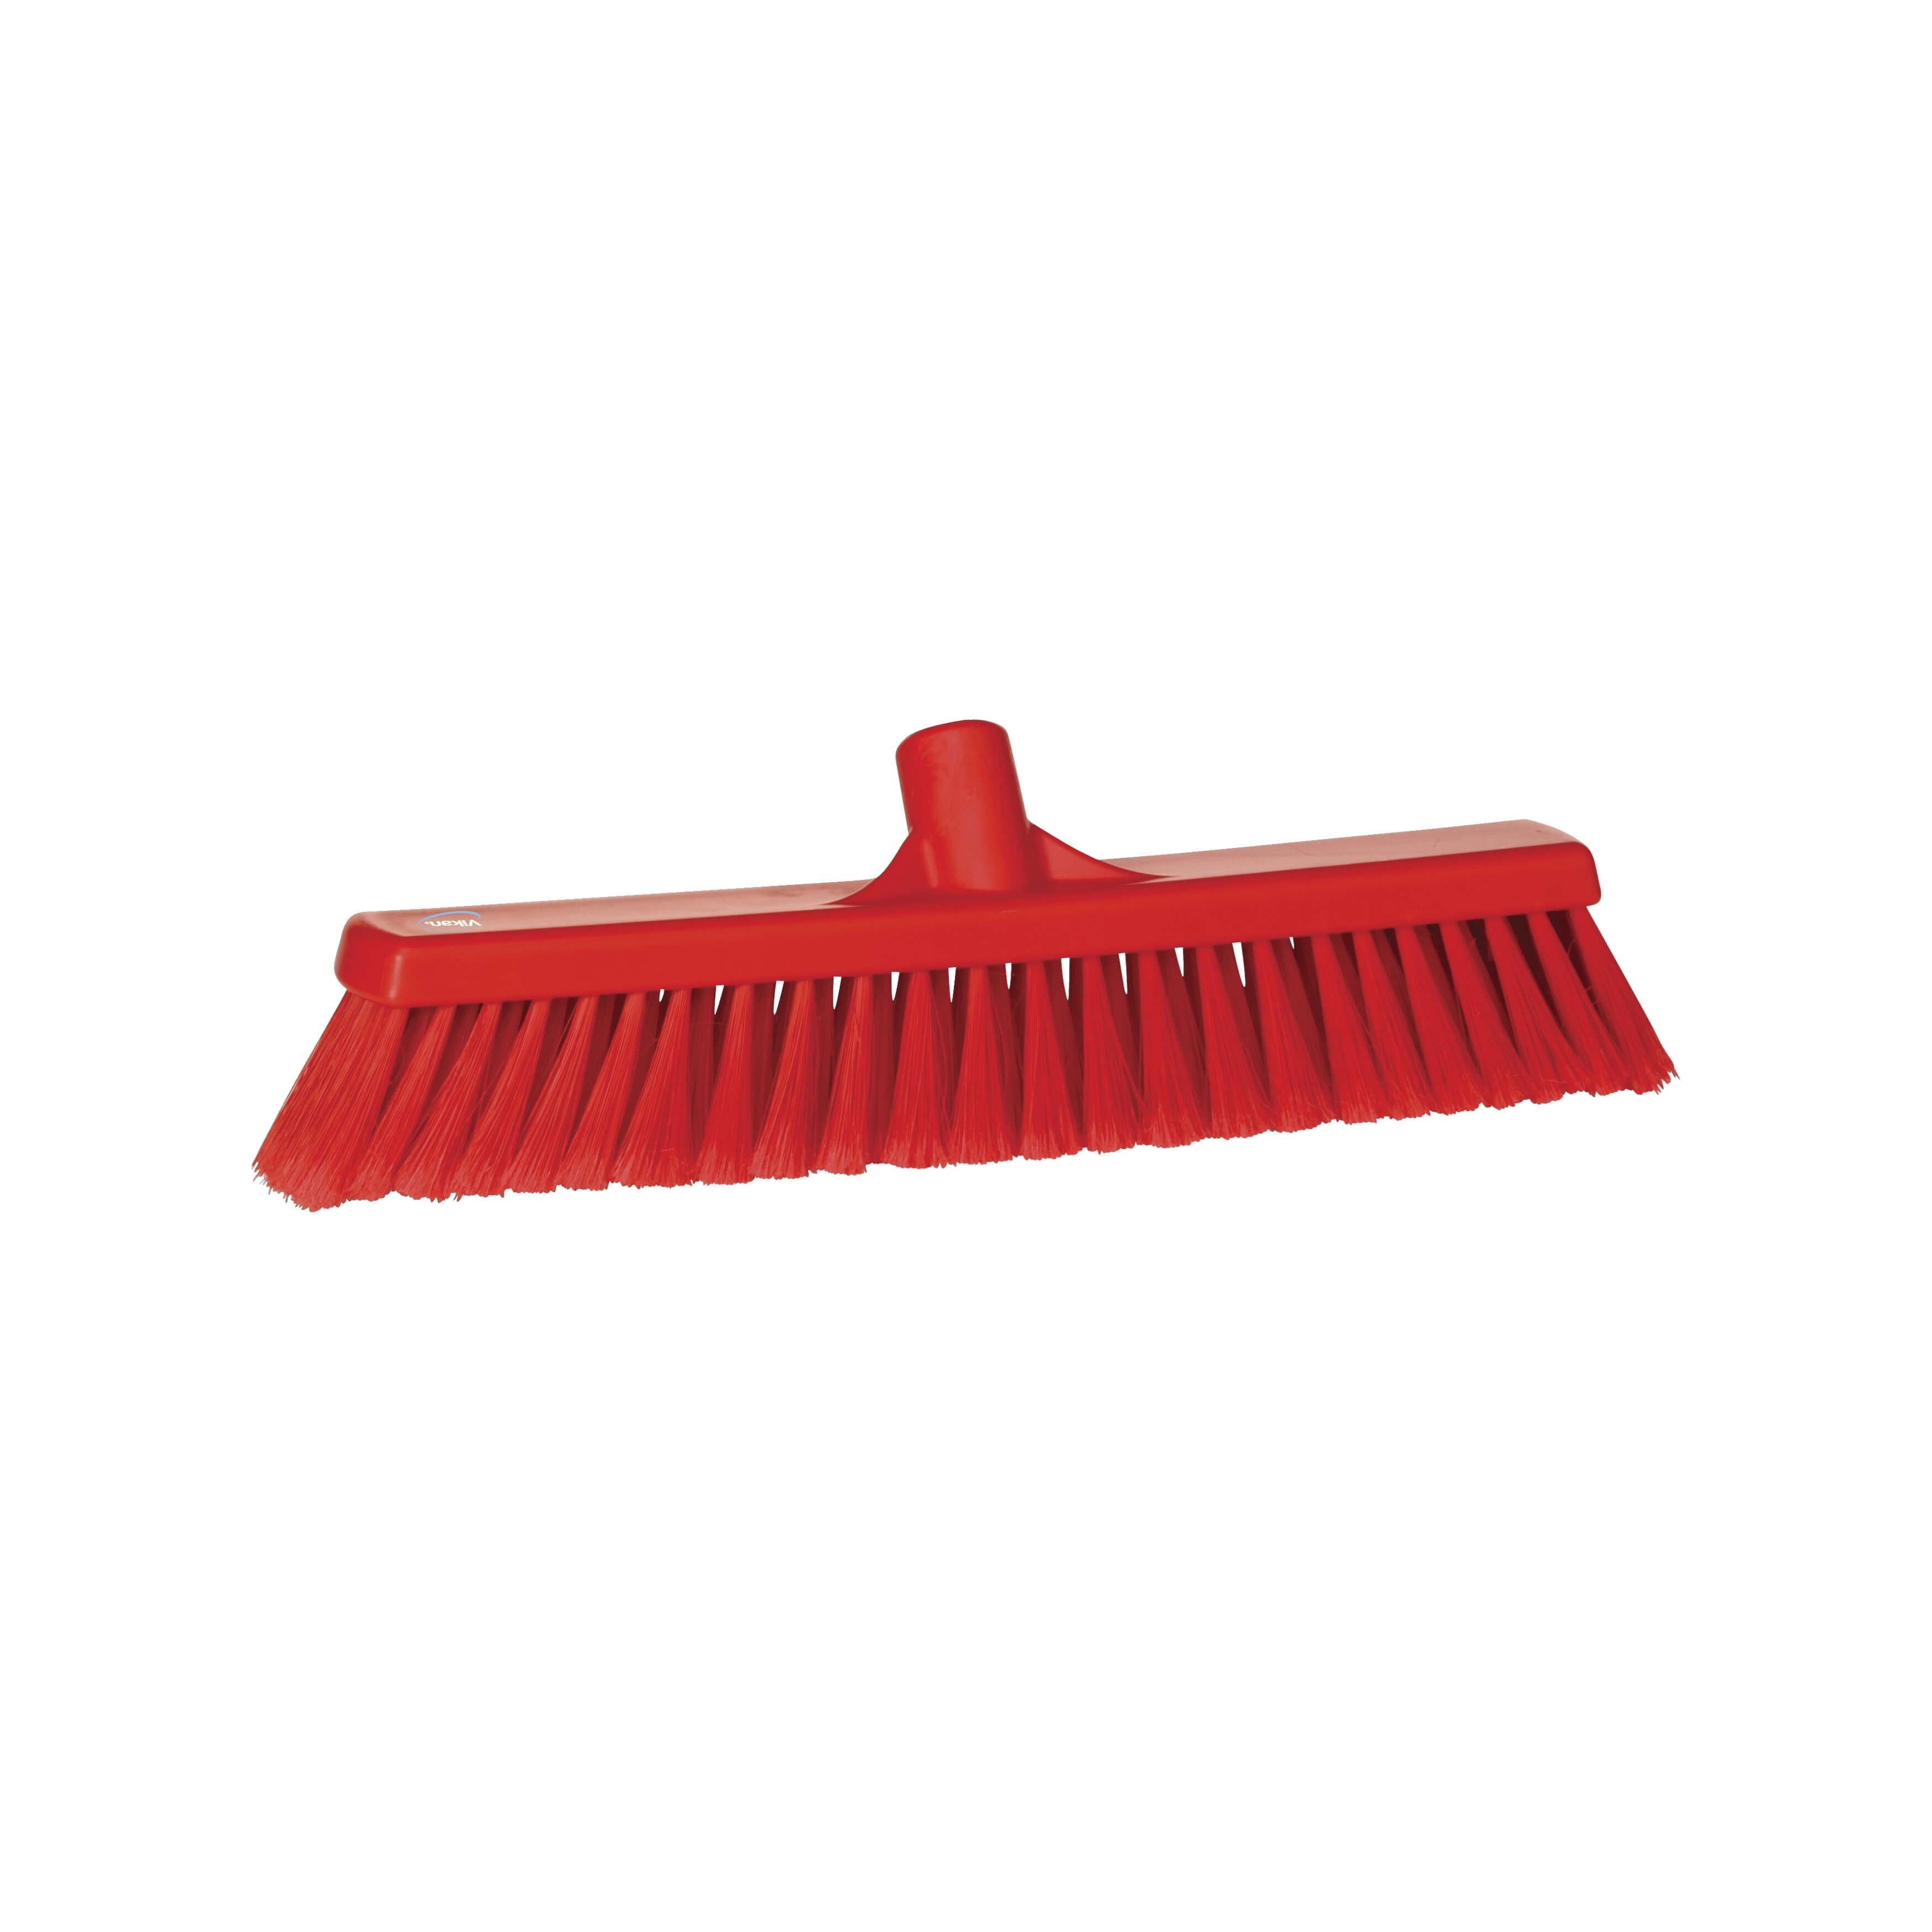 Fejekoste og sweepere